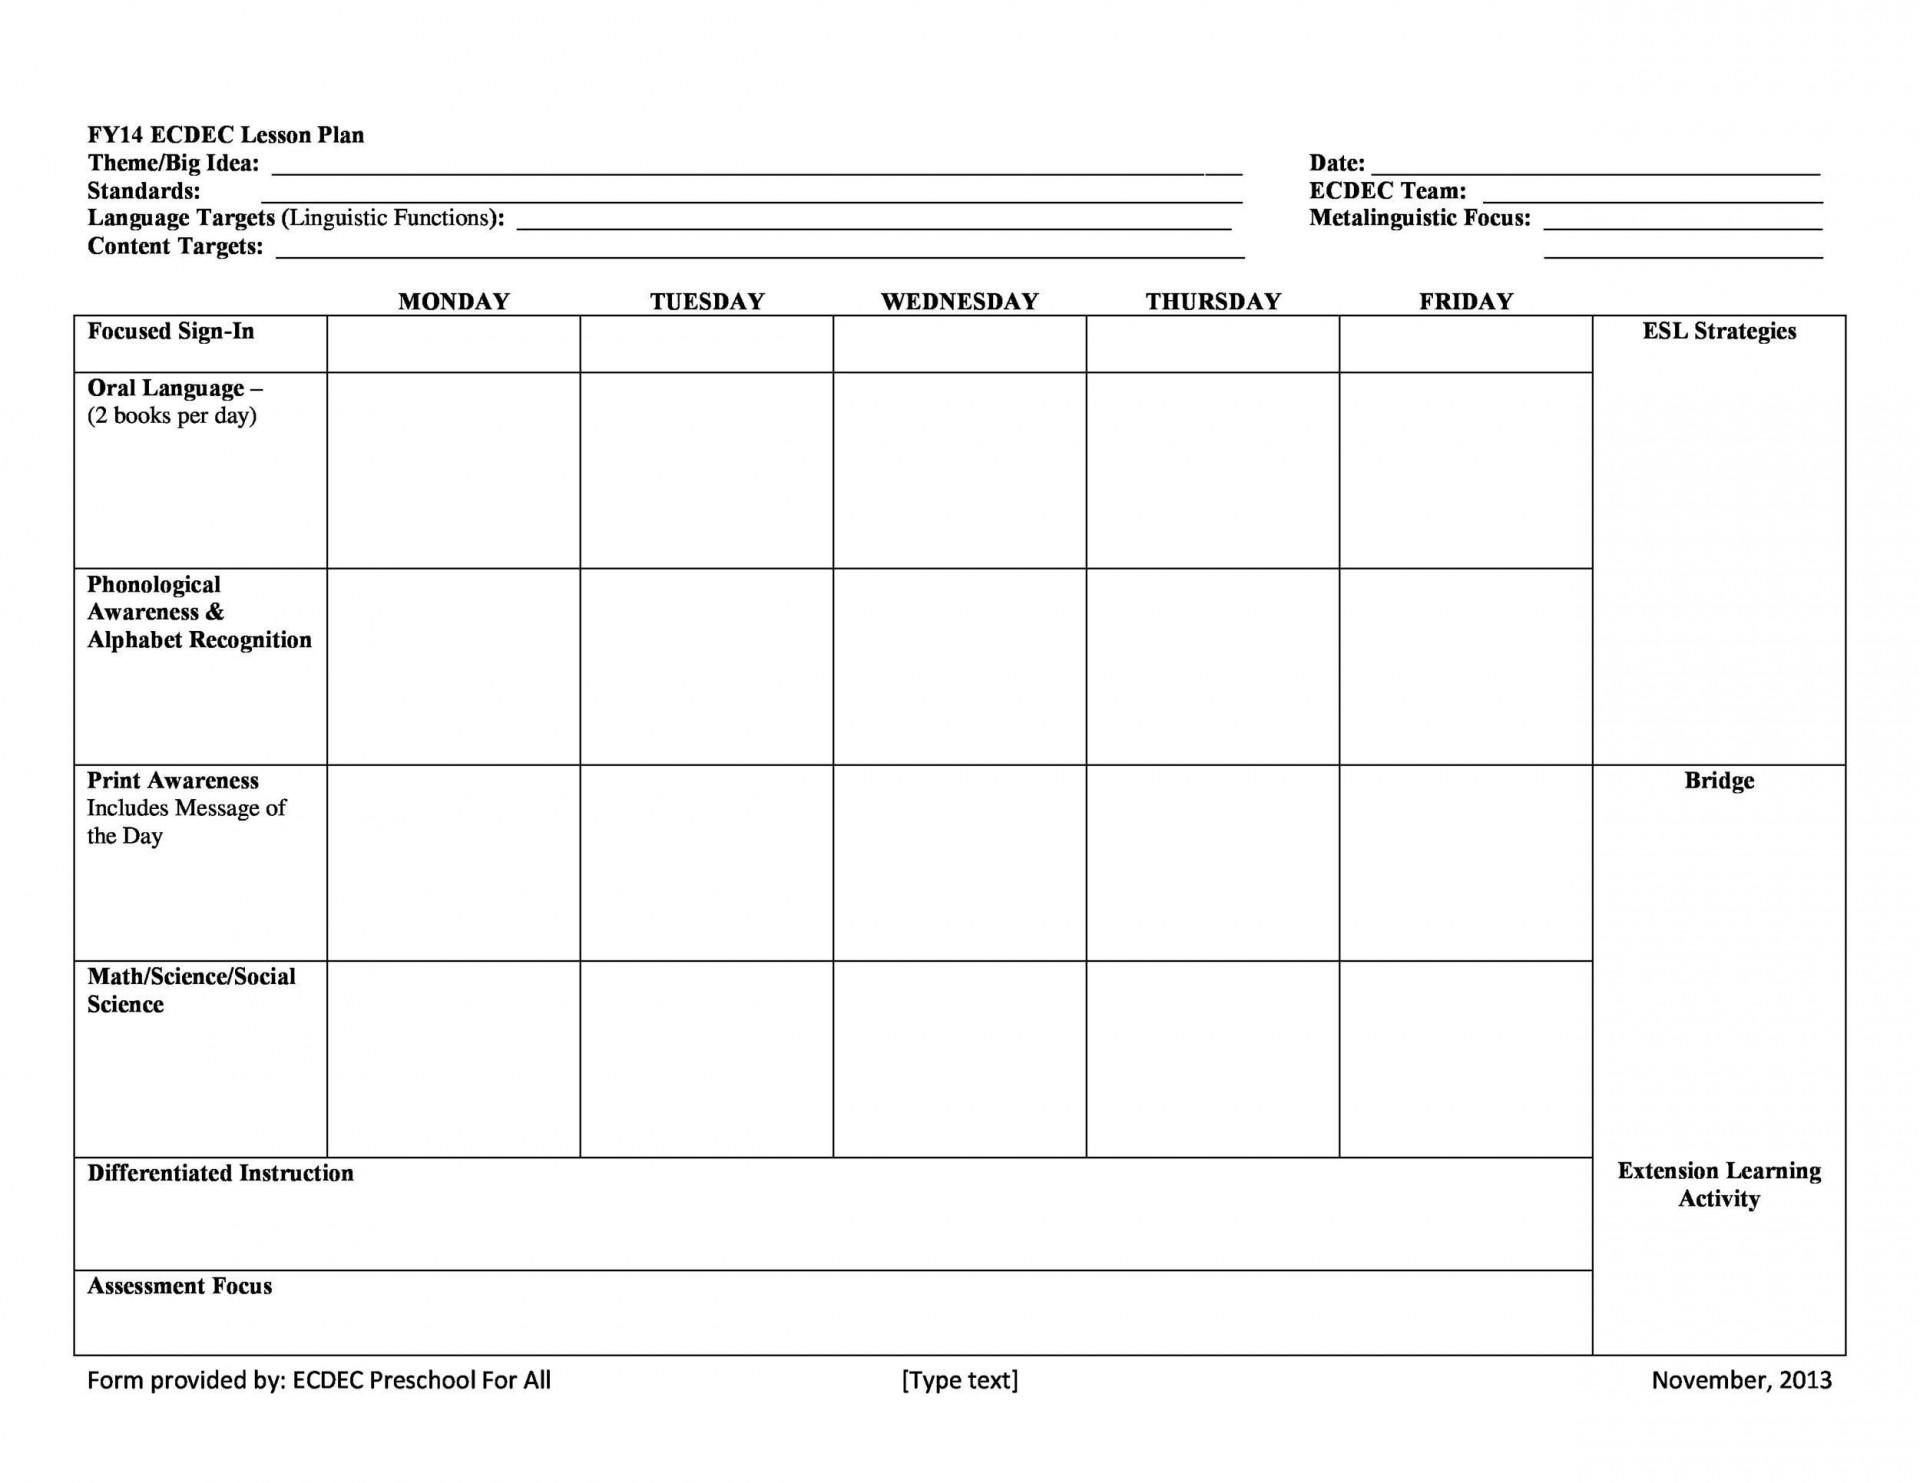 006 Astounding Pre K Lesson Plan Template Printable Image  Pre-k1920